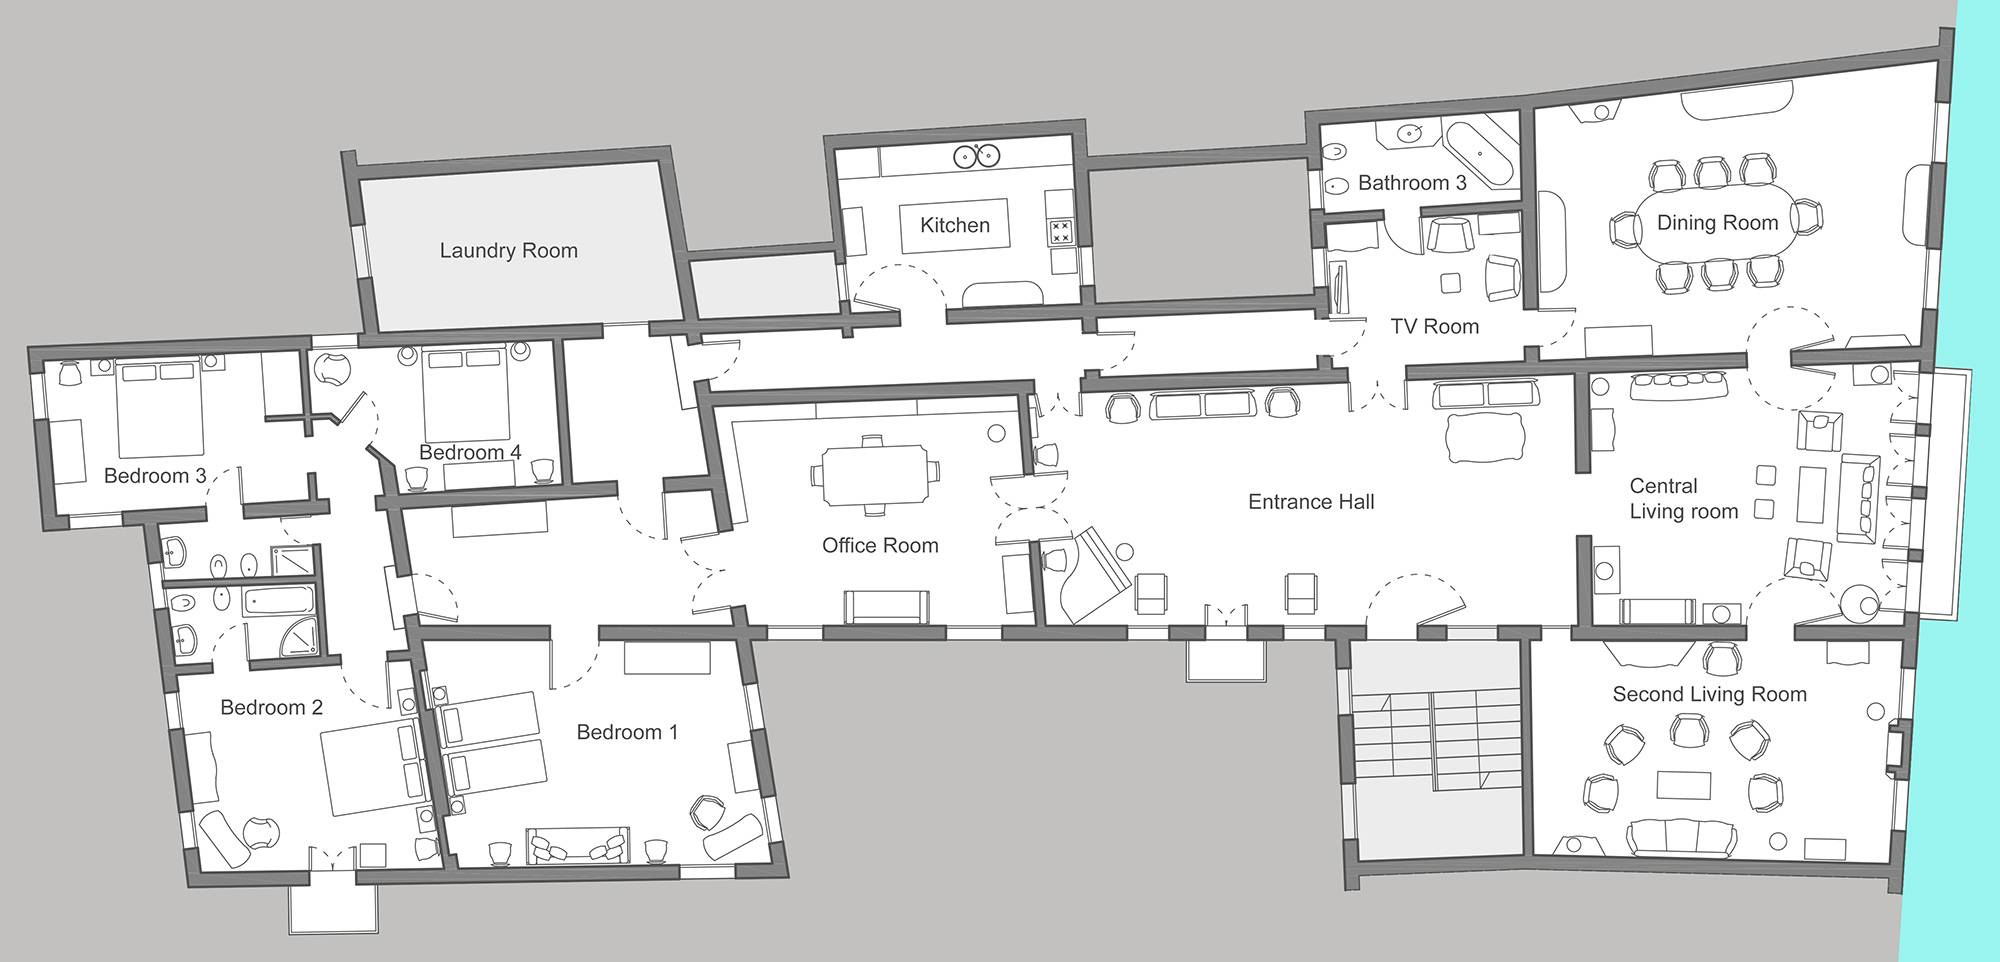 Serenissima floor plan